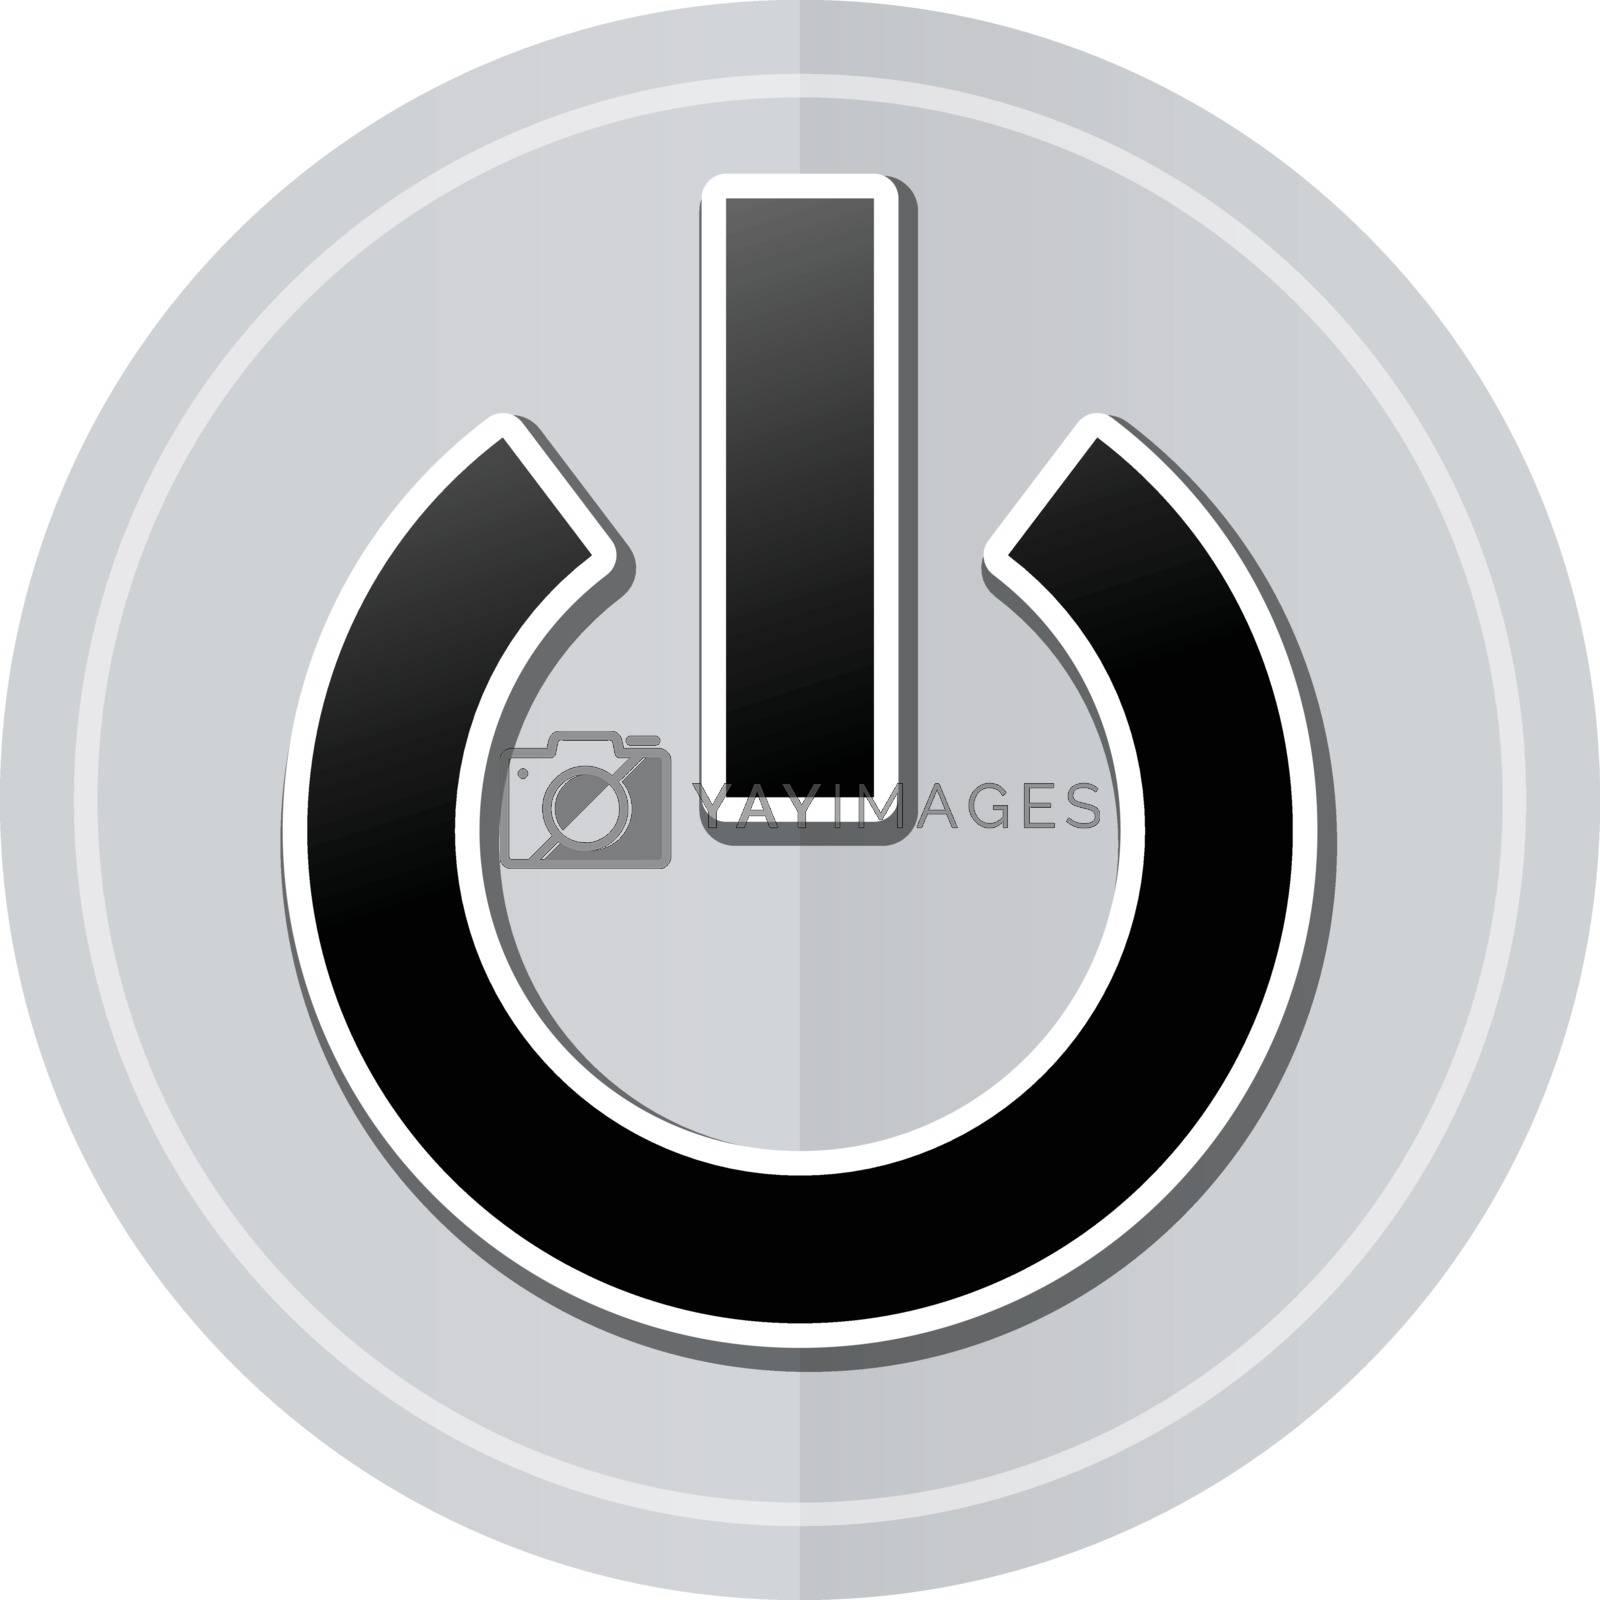 Illustration of power sticker icon simple design